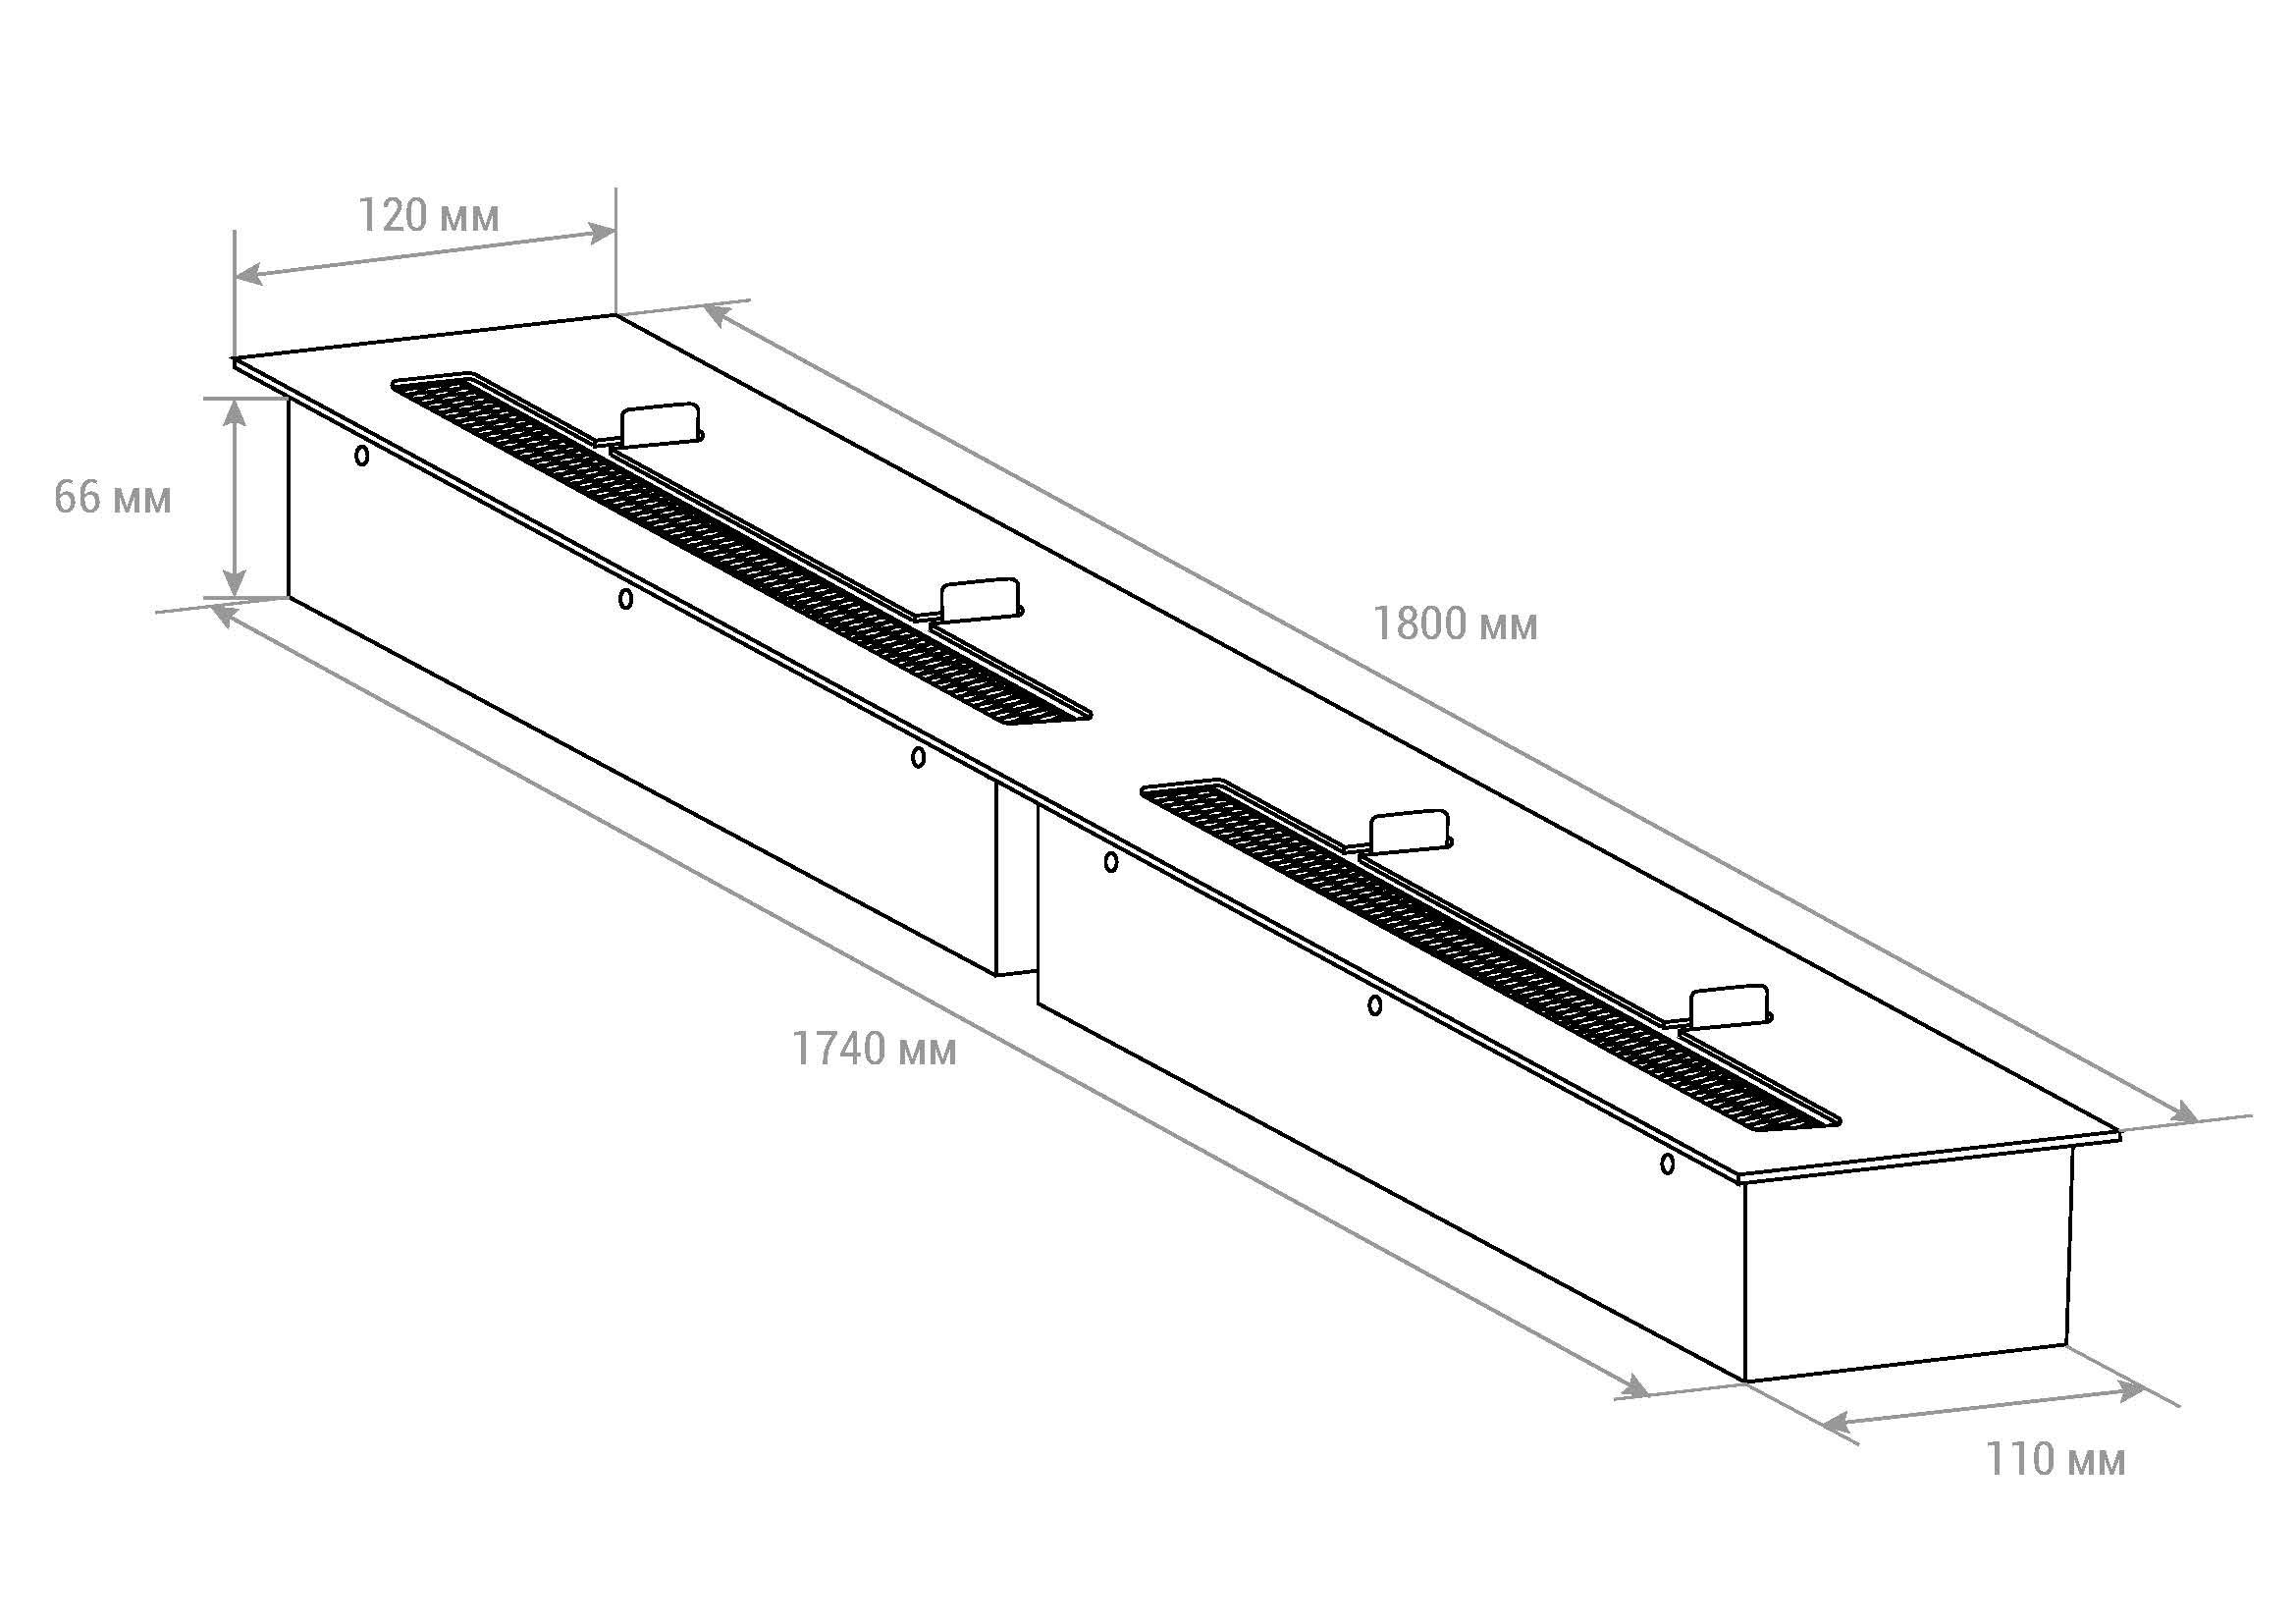 Топливный блок Lux Fire 1800 M чертеж схема